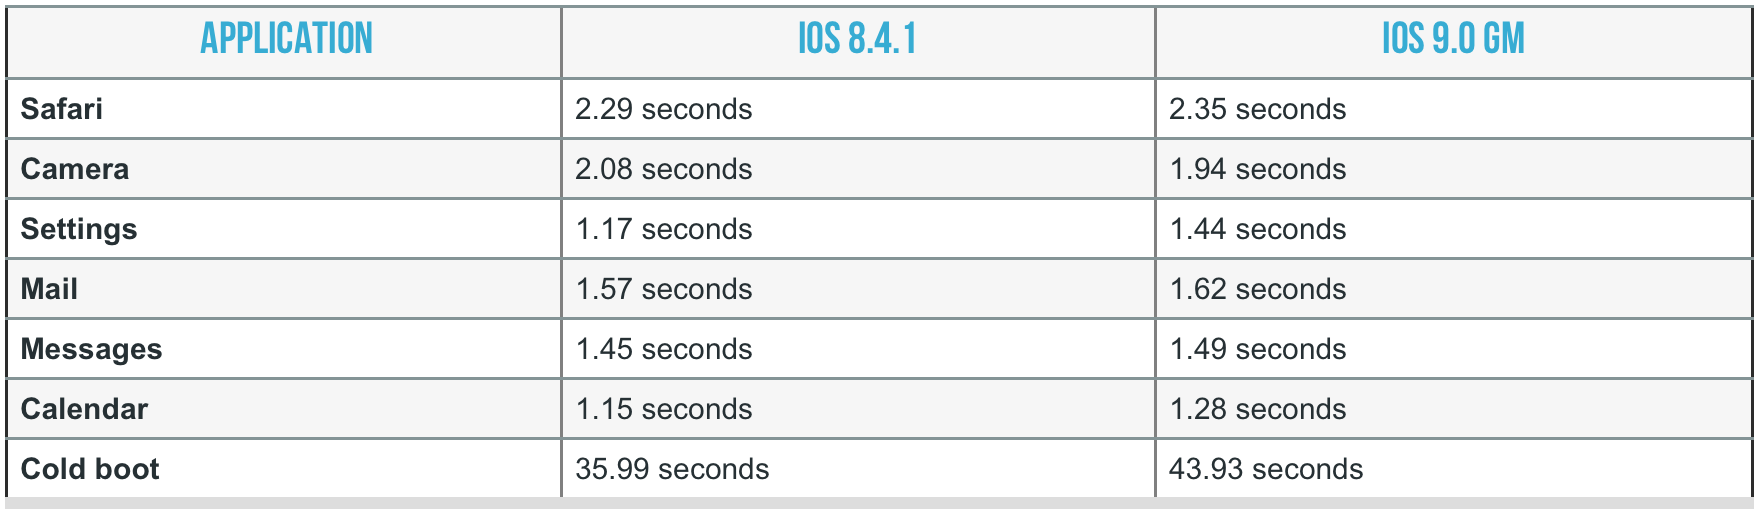 ios9-iphone4s-arstech